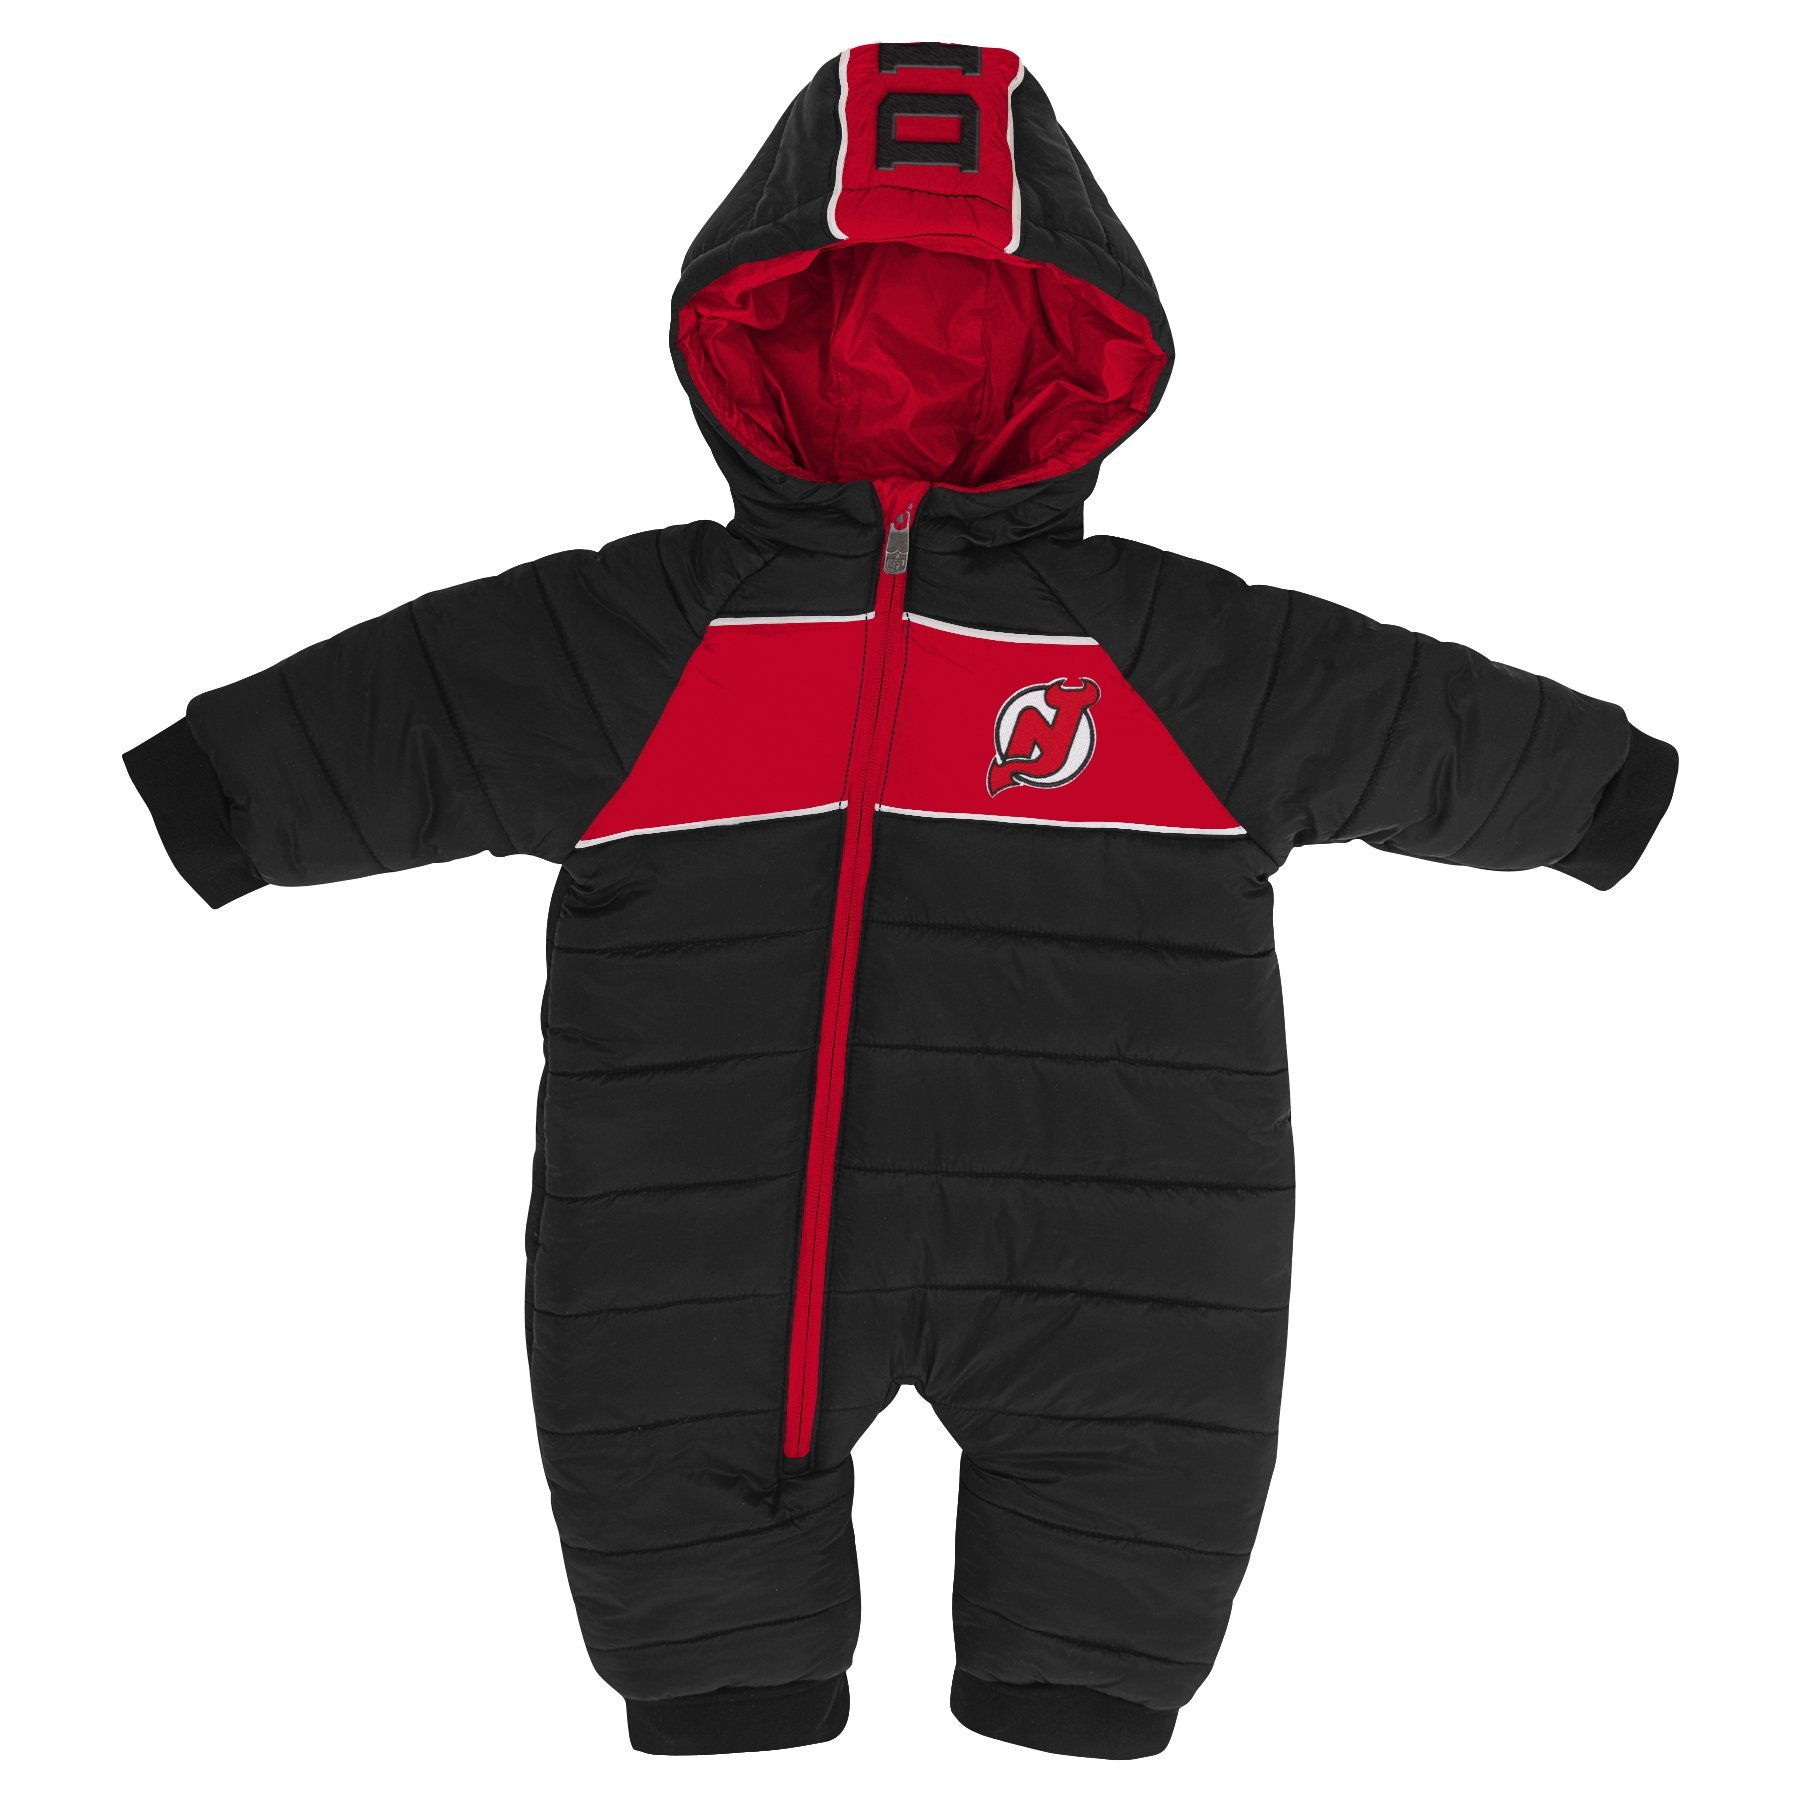 quality design cd579 f1c6c Details about Outerstuff NHL New Jersey Devils Newborn & Infant Puck Drop  Puffer Bodysuit, B..